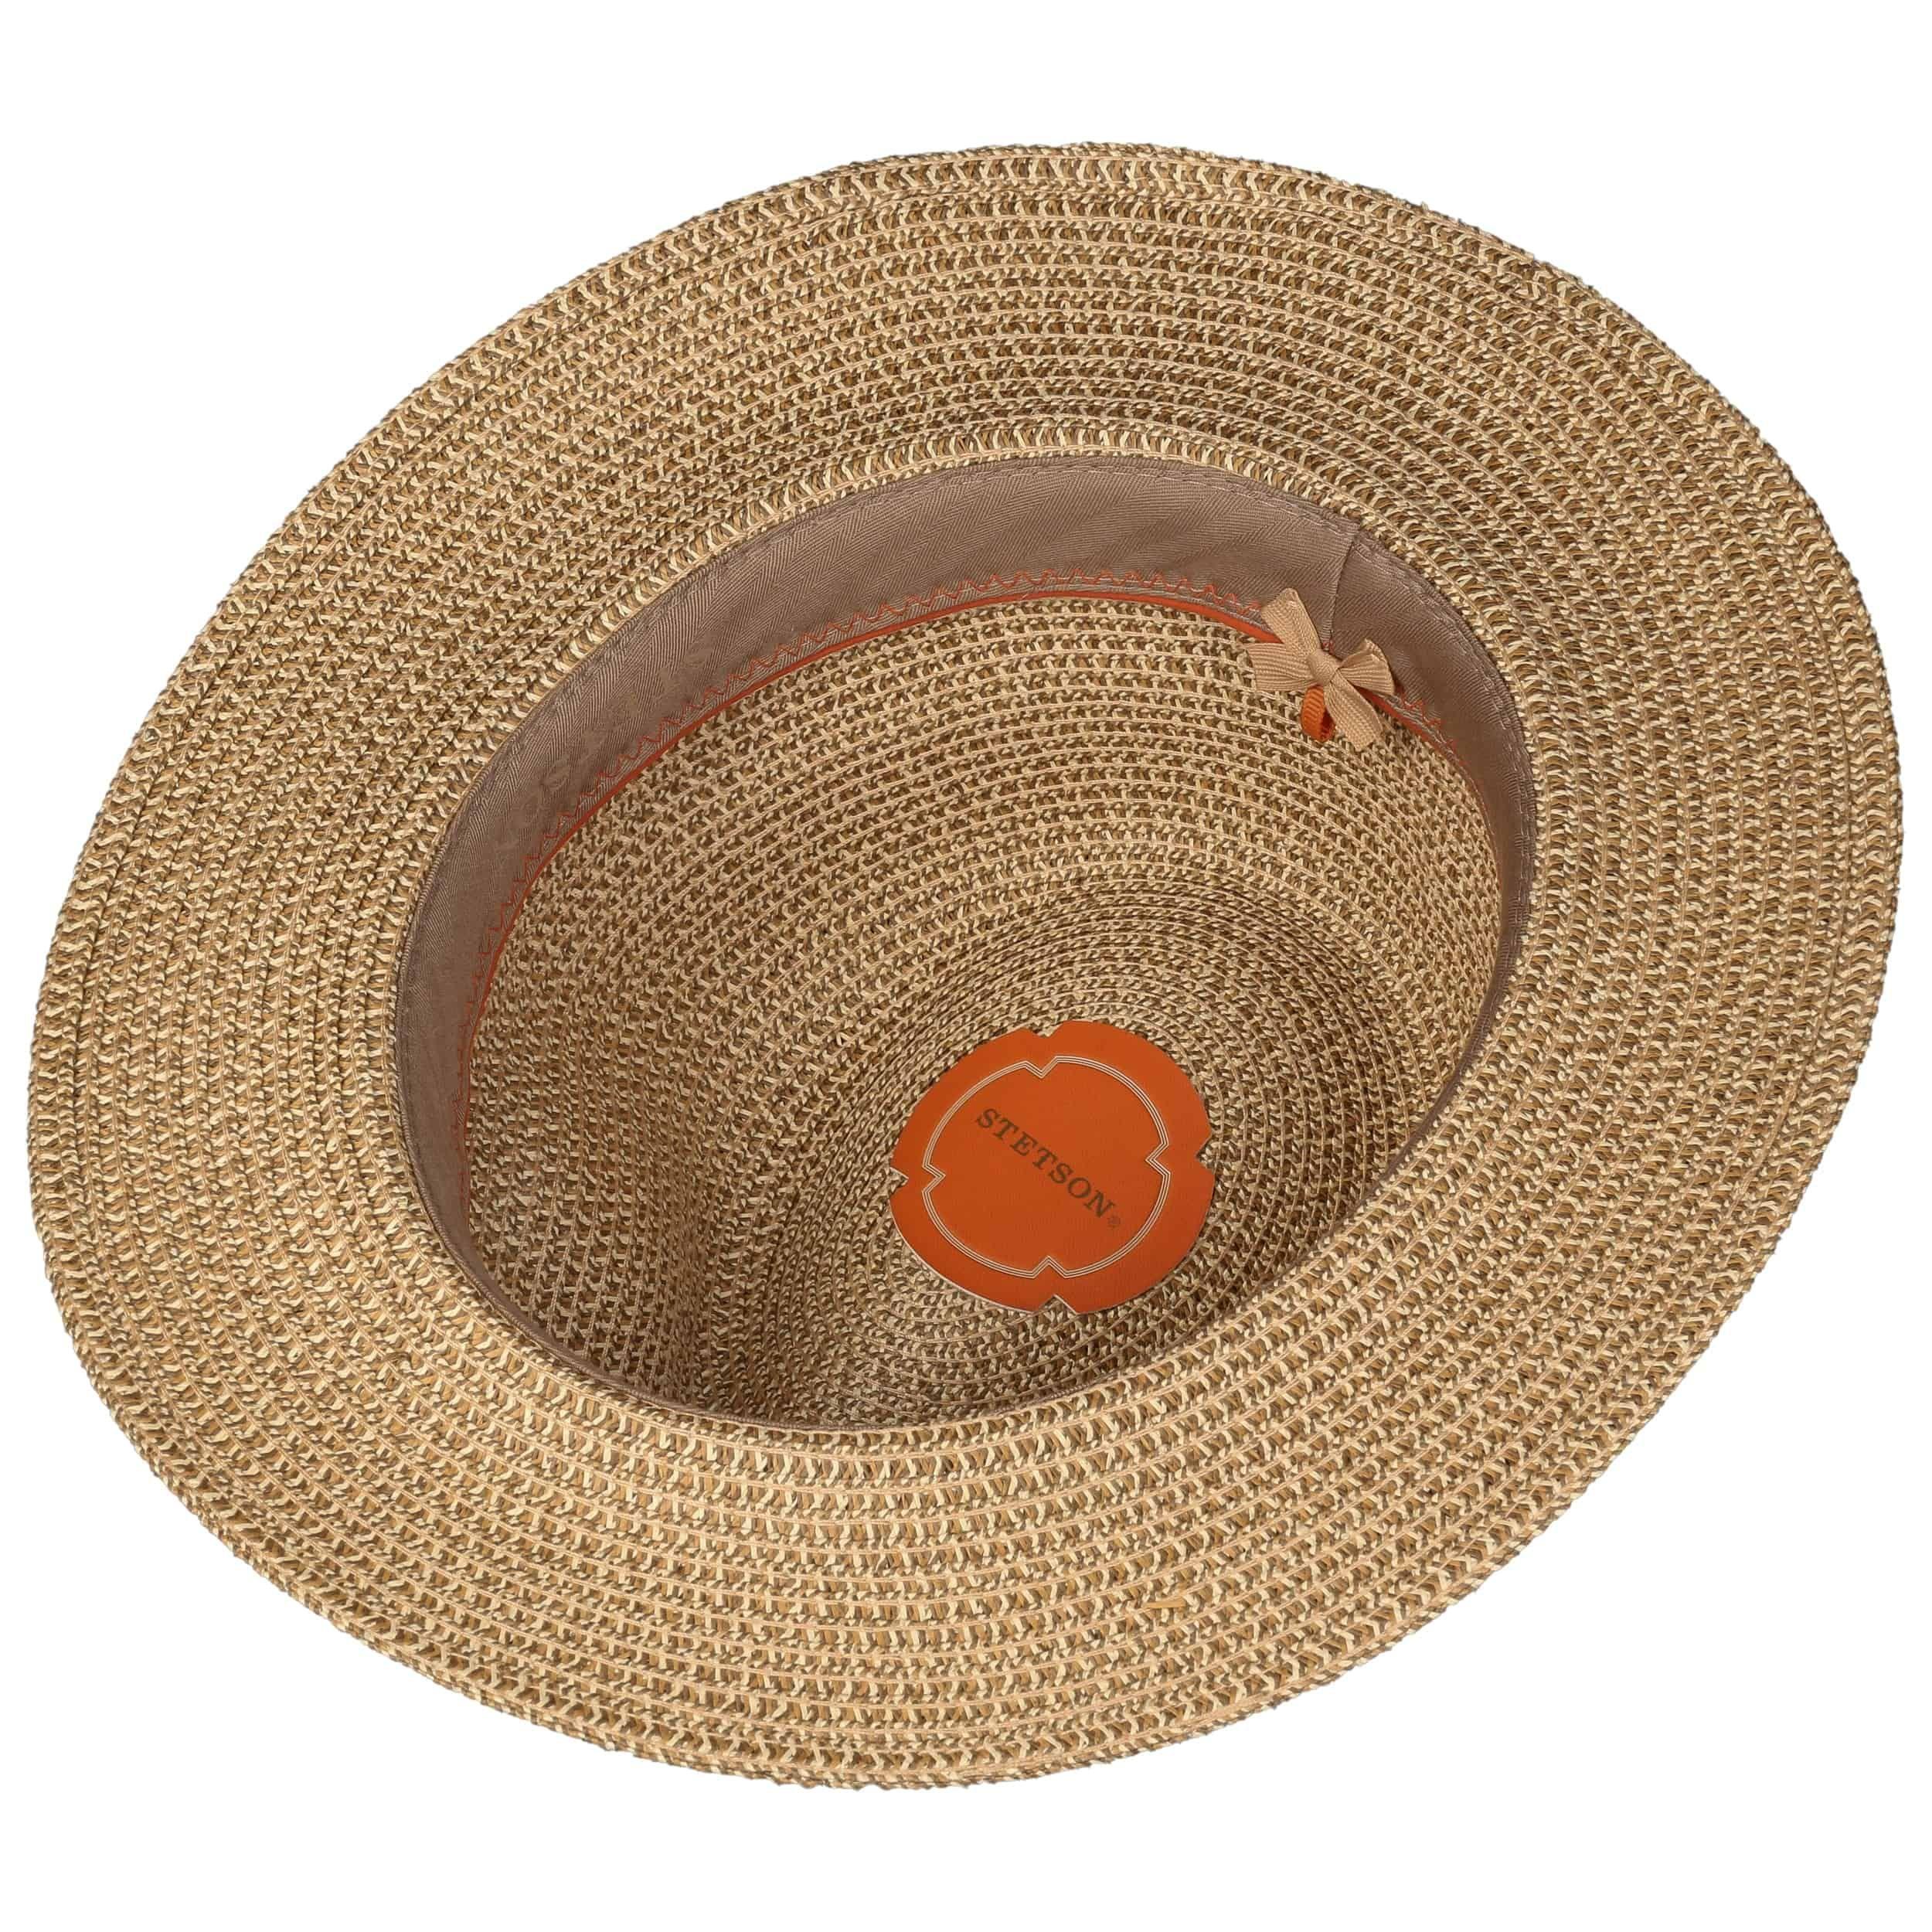 Paladon Toyo Traveller Hat brown